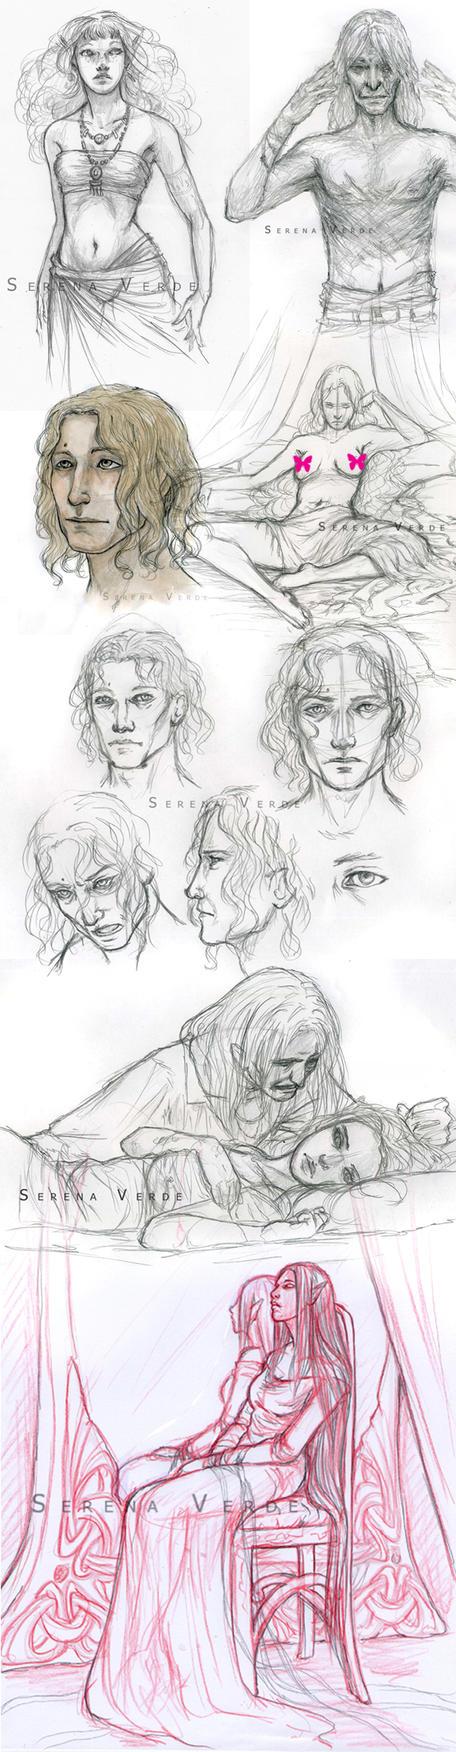 Inavesu Sketchdump - I by SerenaVerdeArt